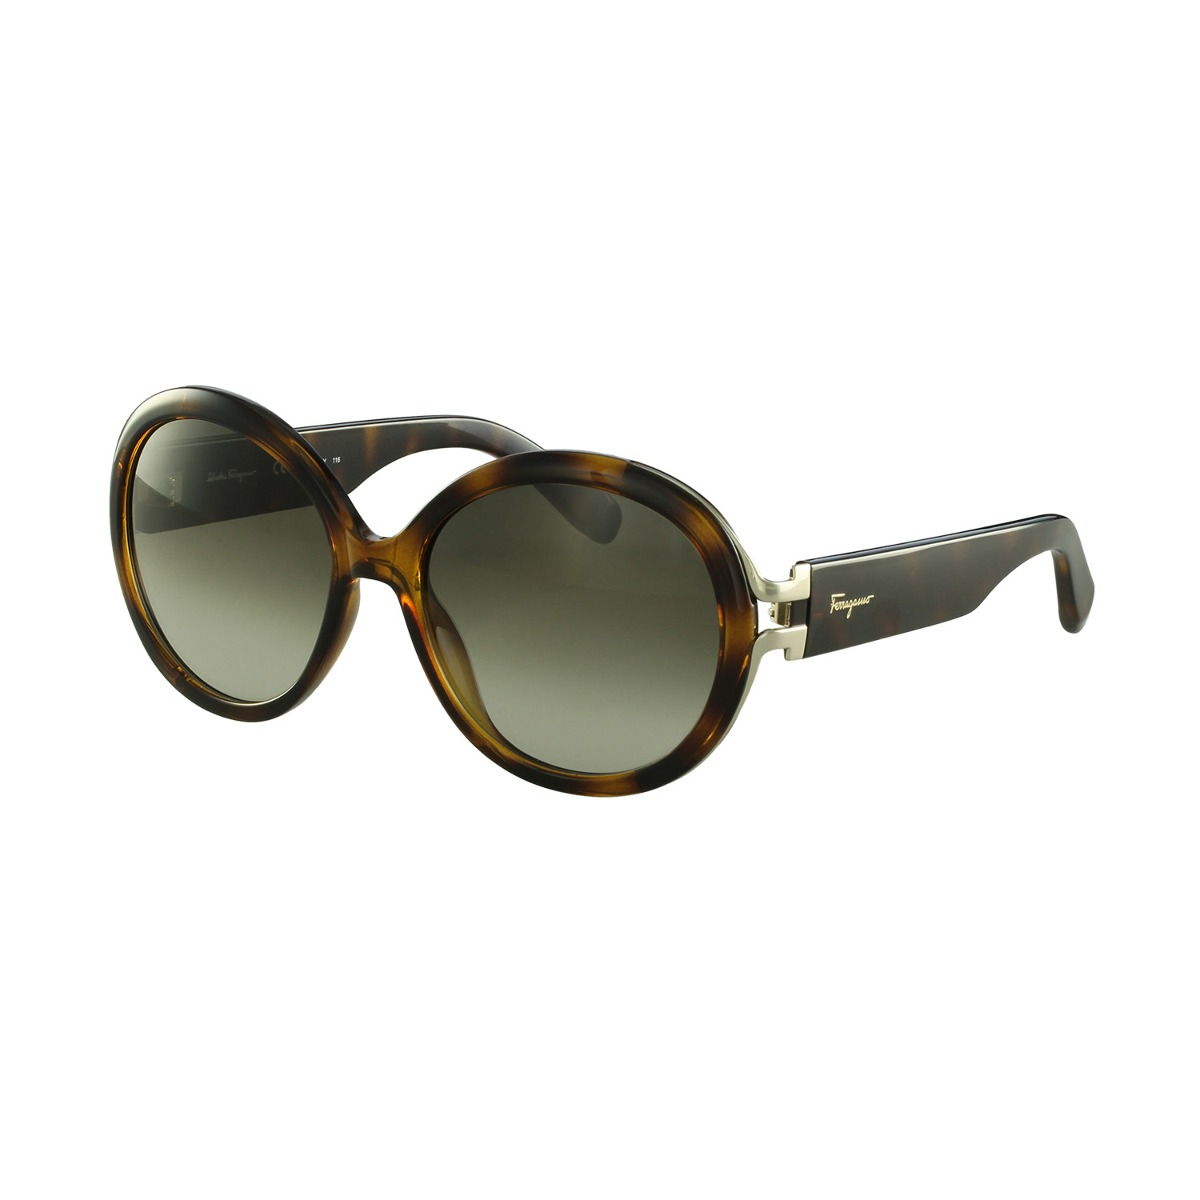 bcc407c527f42 Óculos De Sol Salvatore Ferragamo Fashion Marrom - R  1.380,00 em ...